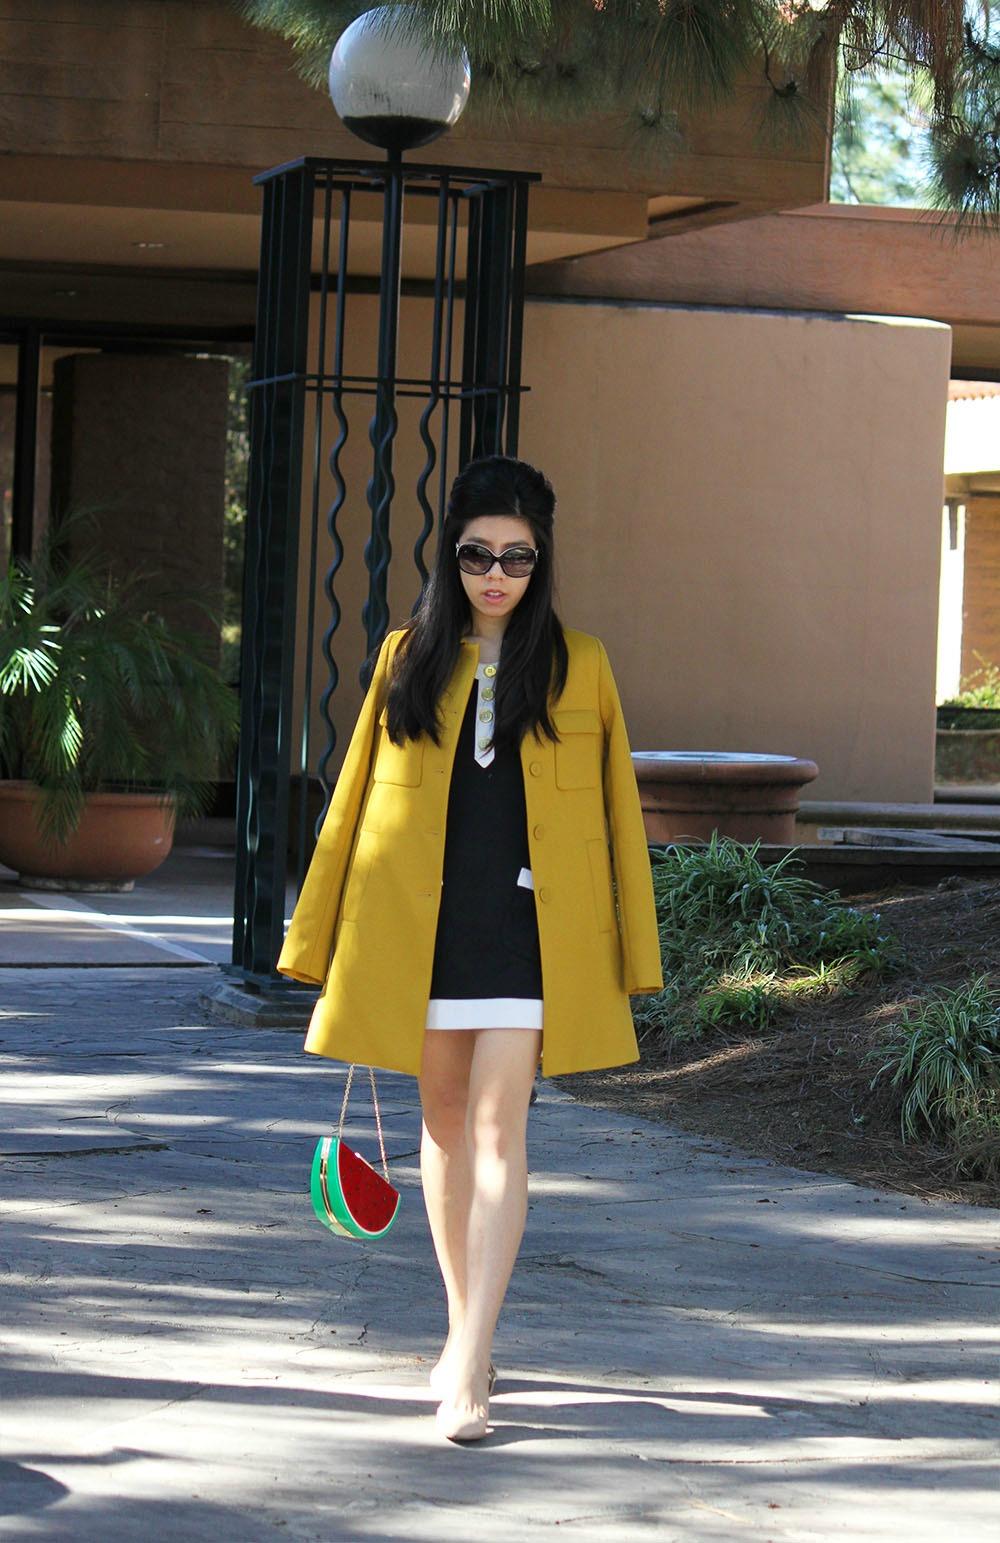 Adrienne Nguyen_Invictus_San Diego fashion Blogger_Student Pharmacist_Hippie